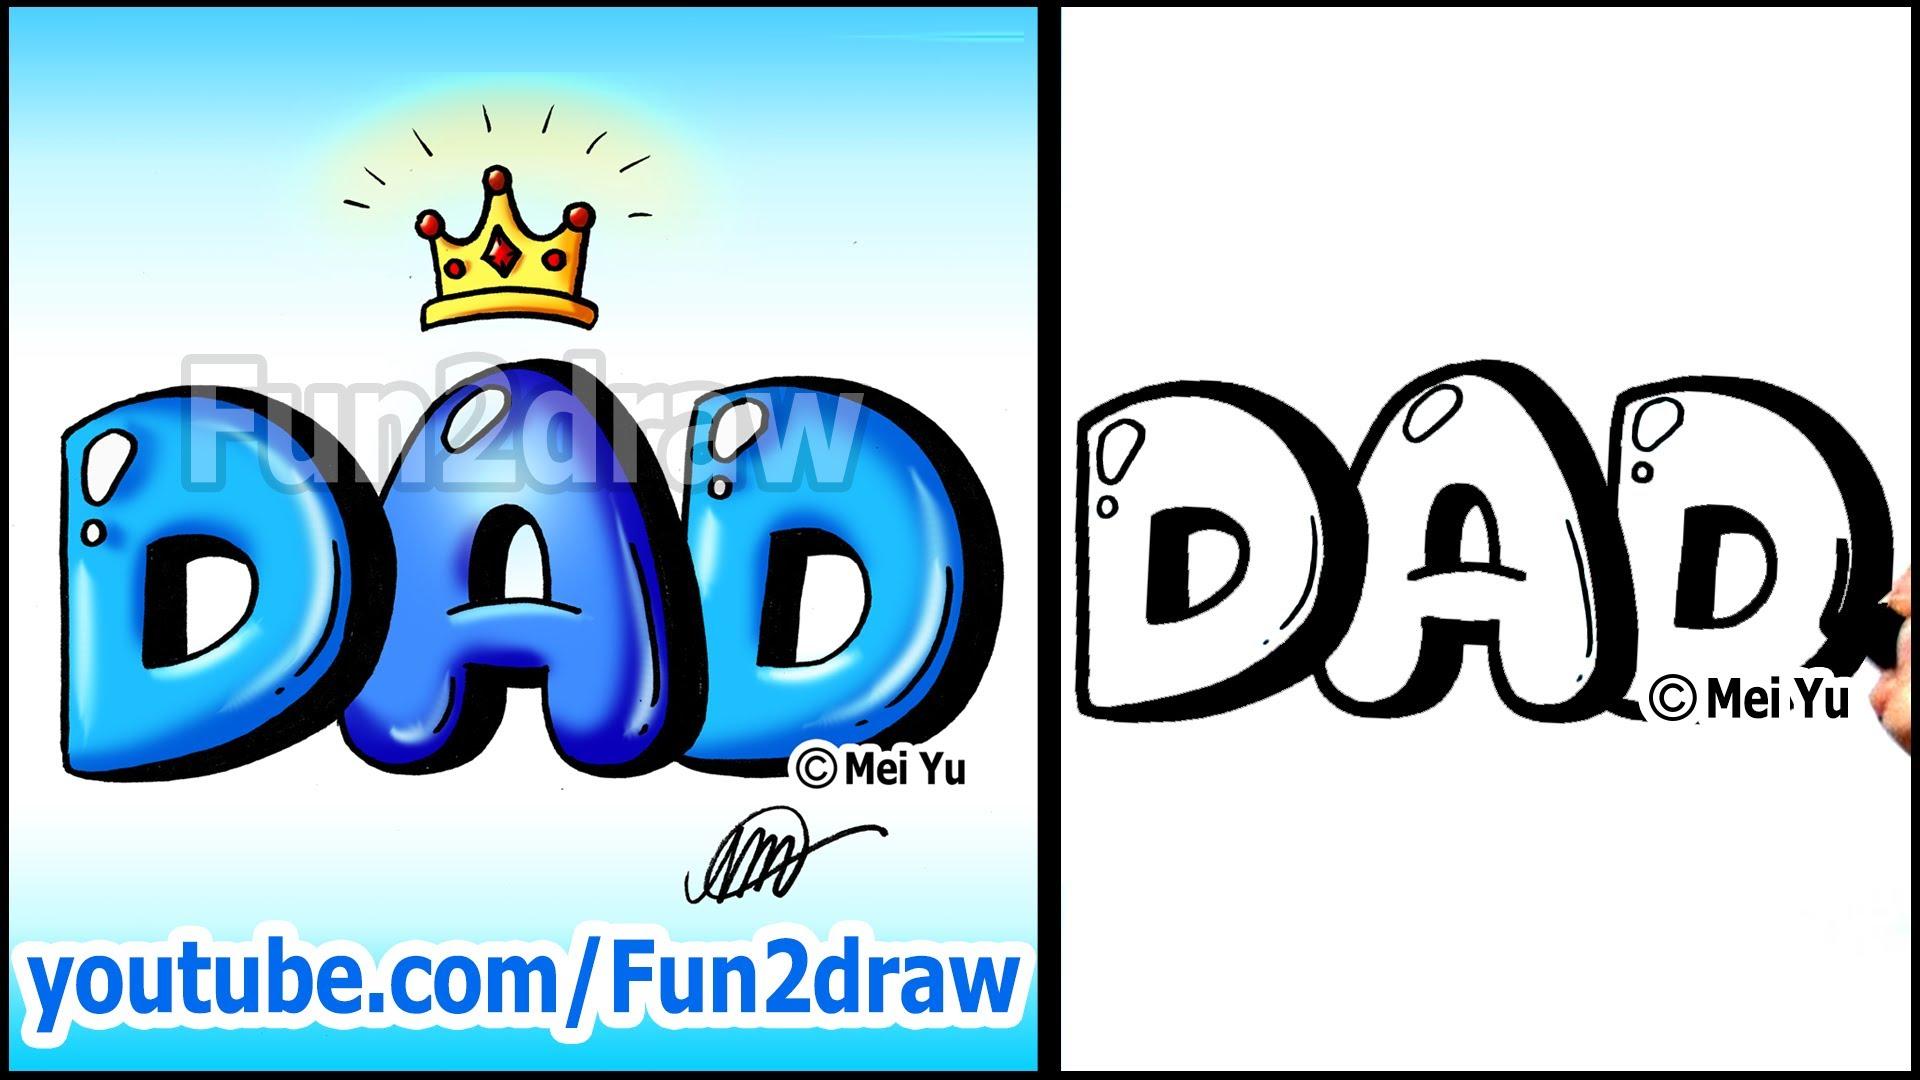 Drawn office easy Dad Graffiti ~ Bubble Youtube